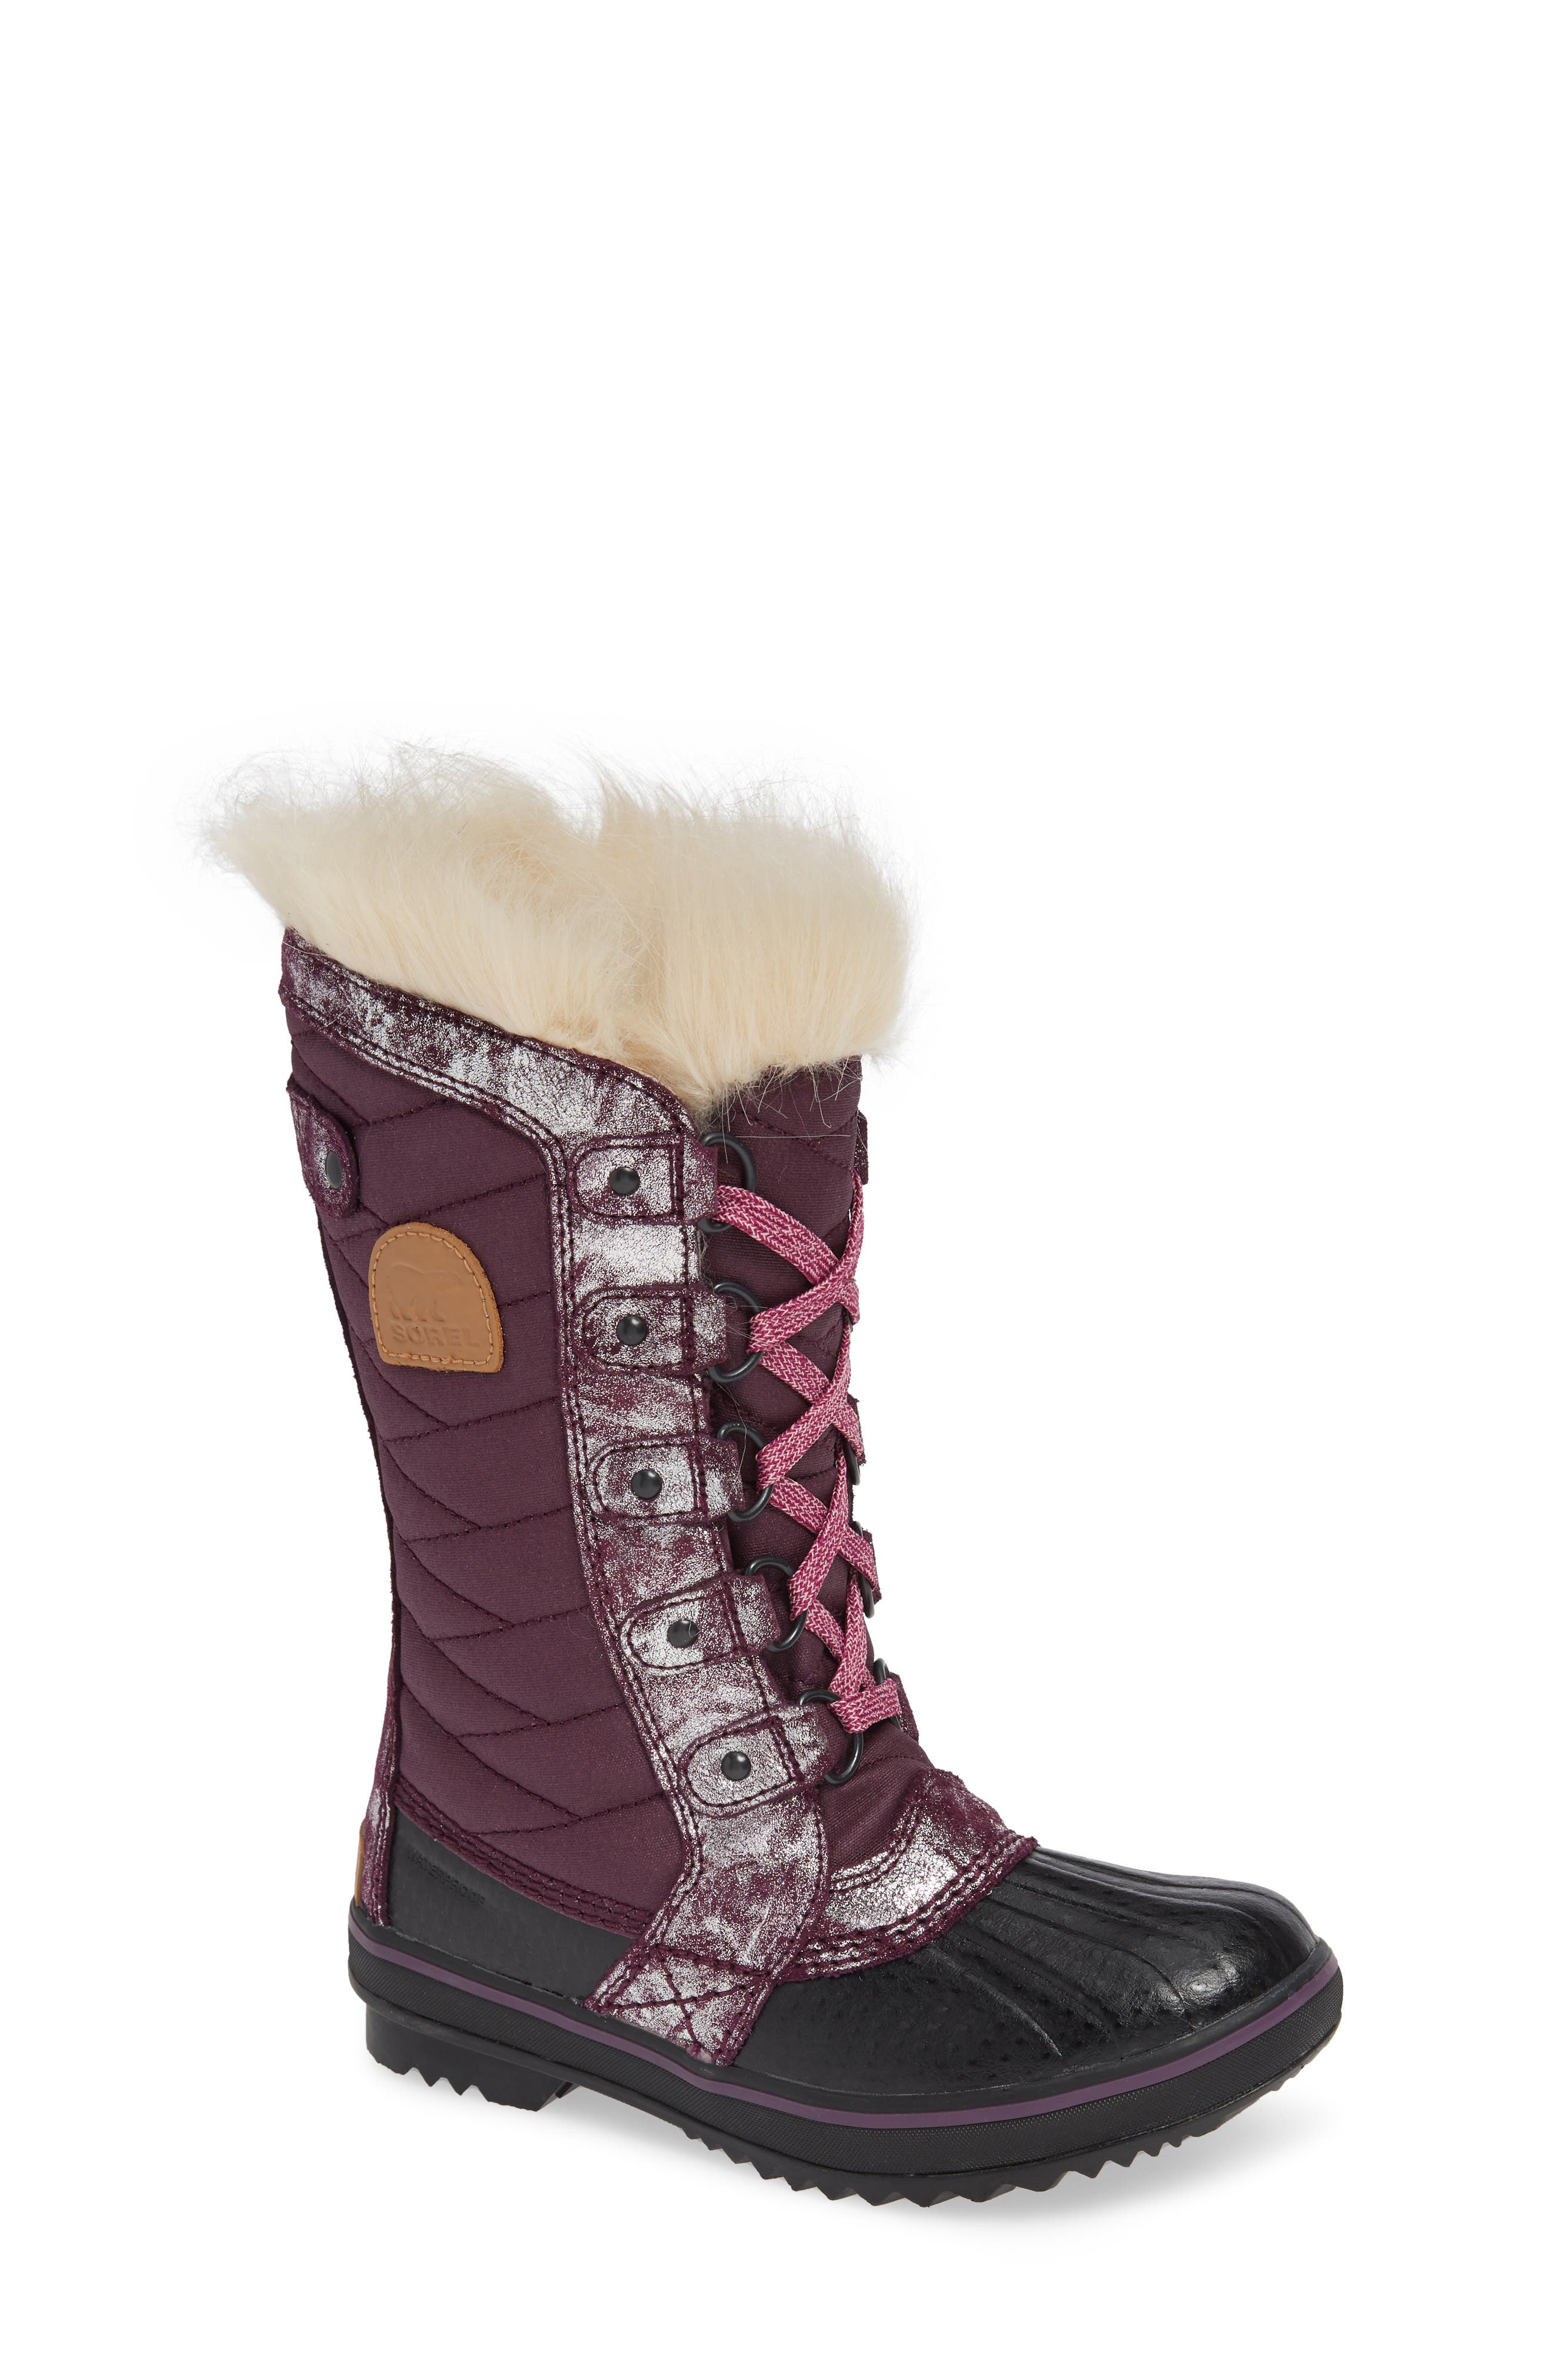 Tofino II Faux Fur Lined Waterproof Boot,                         Main,                         color, 562